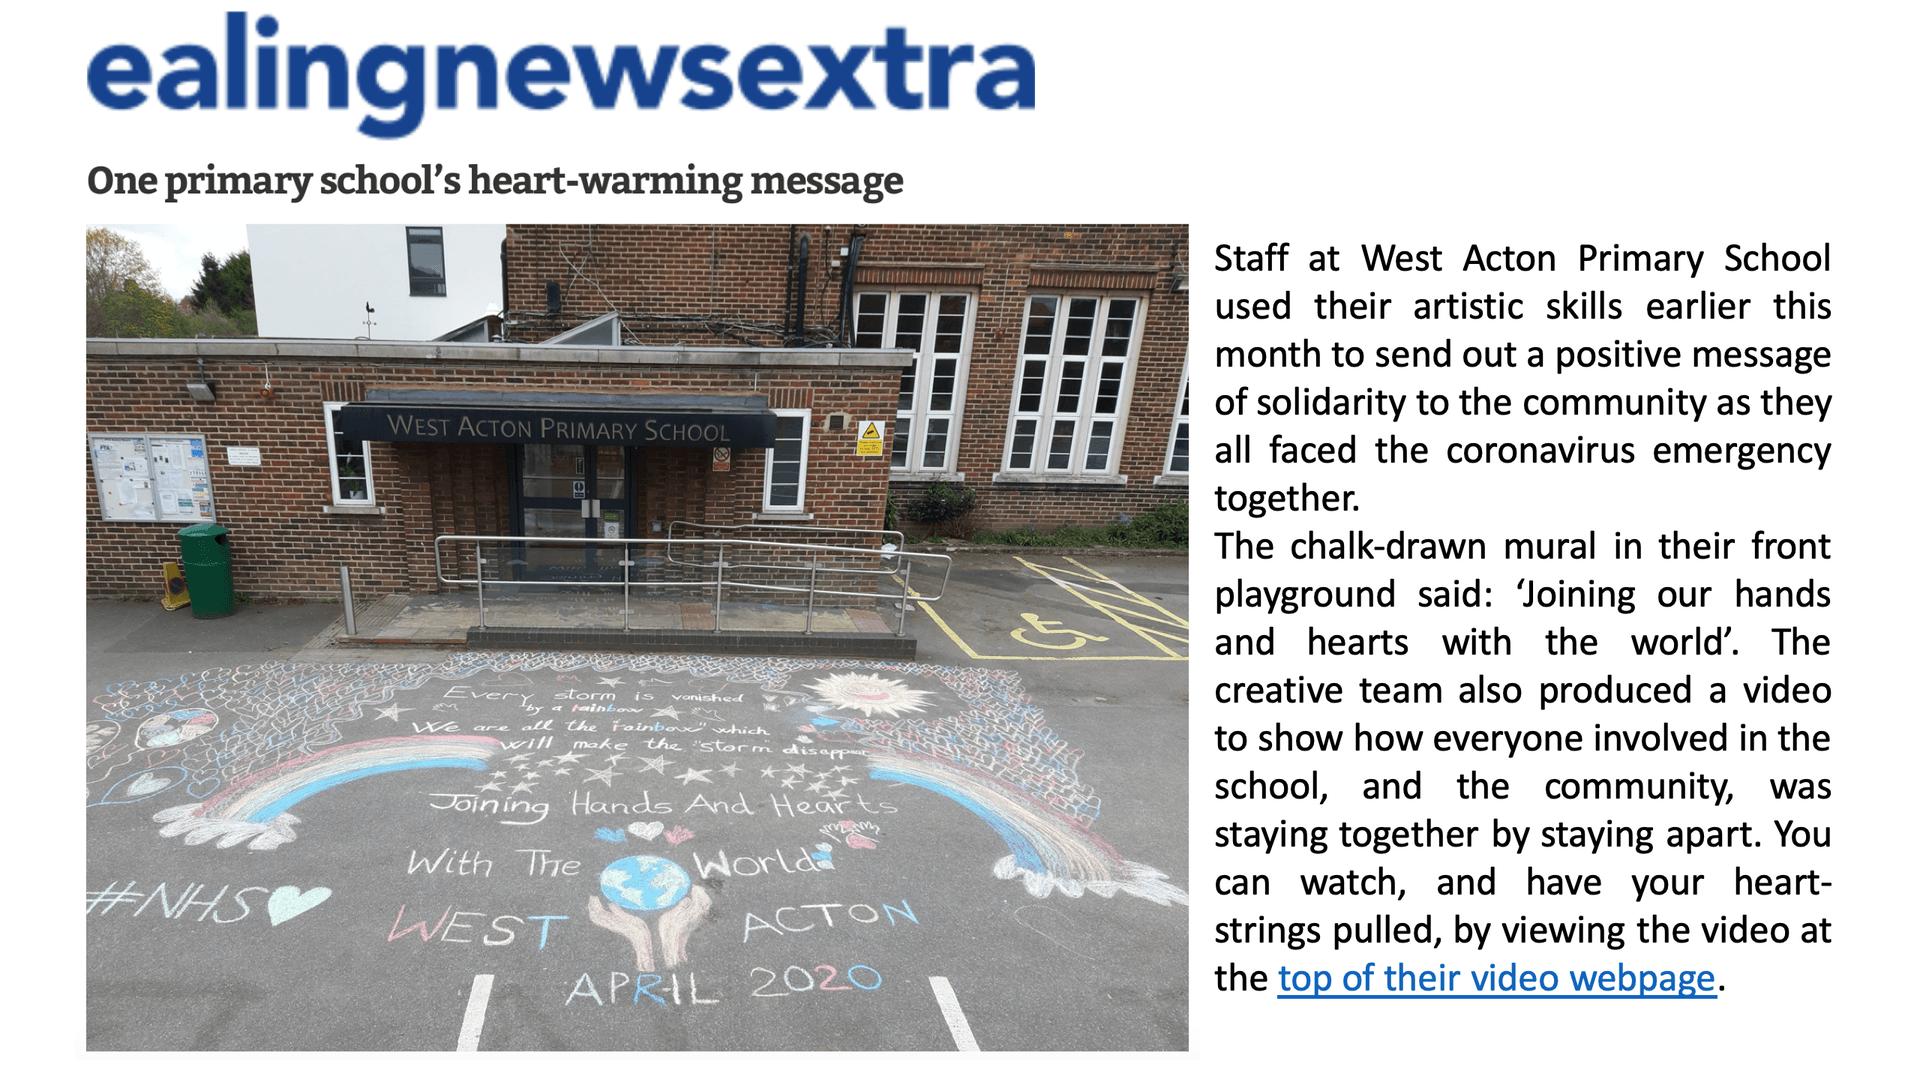 Ealing News Extra - Heartwarming